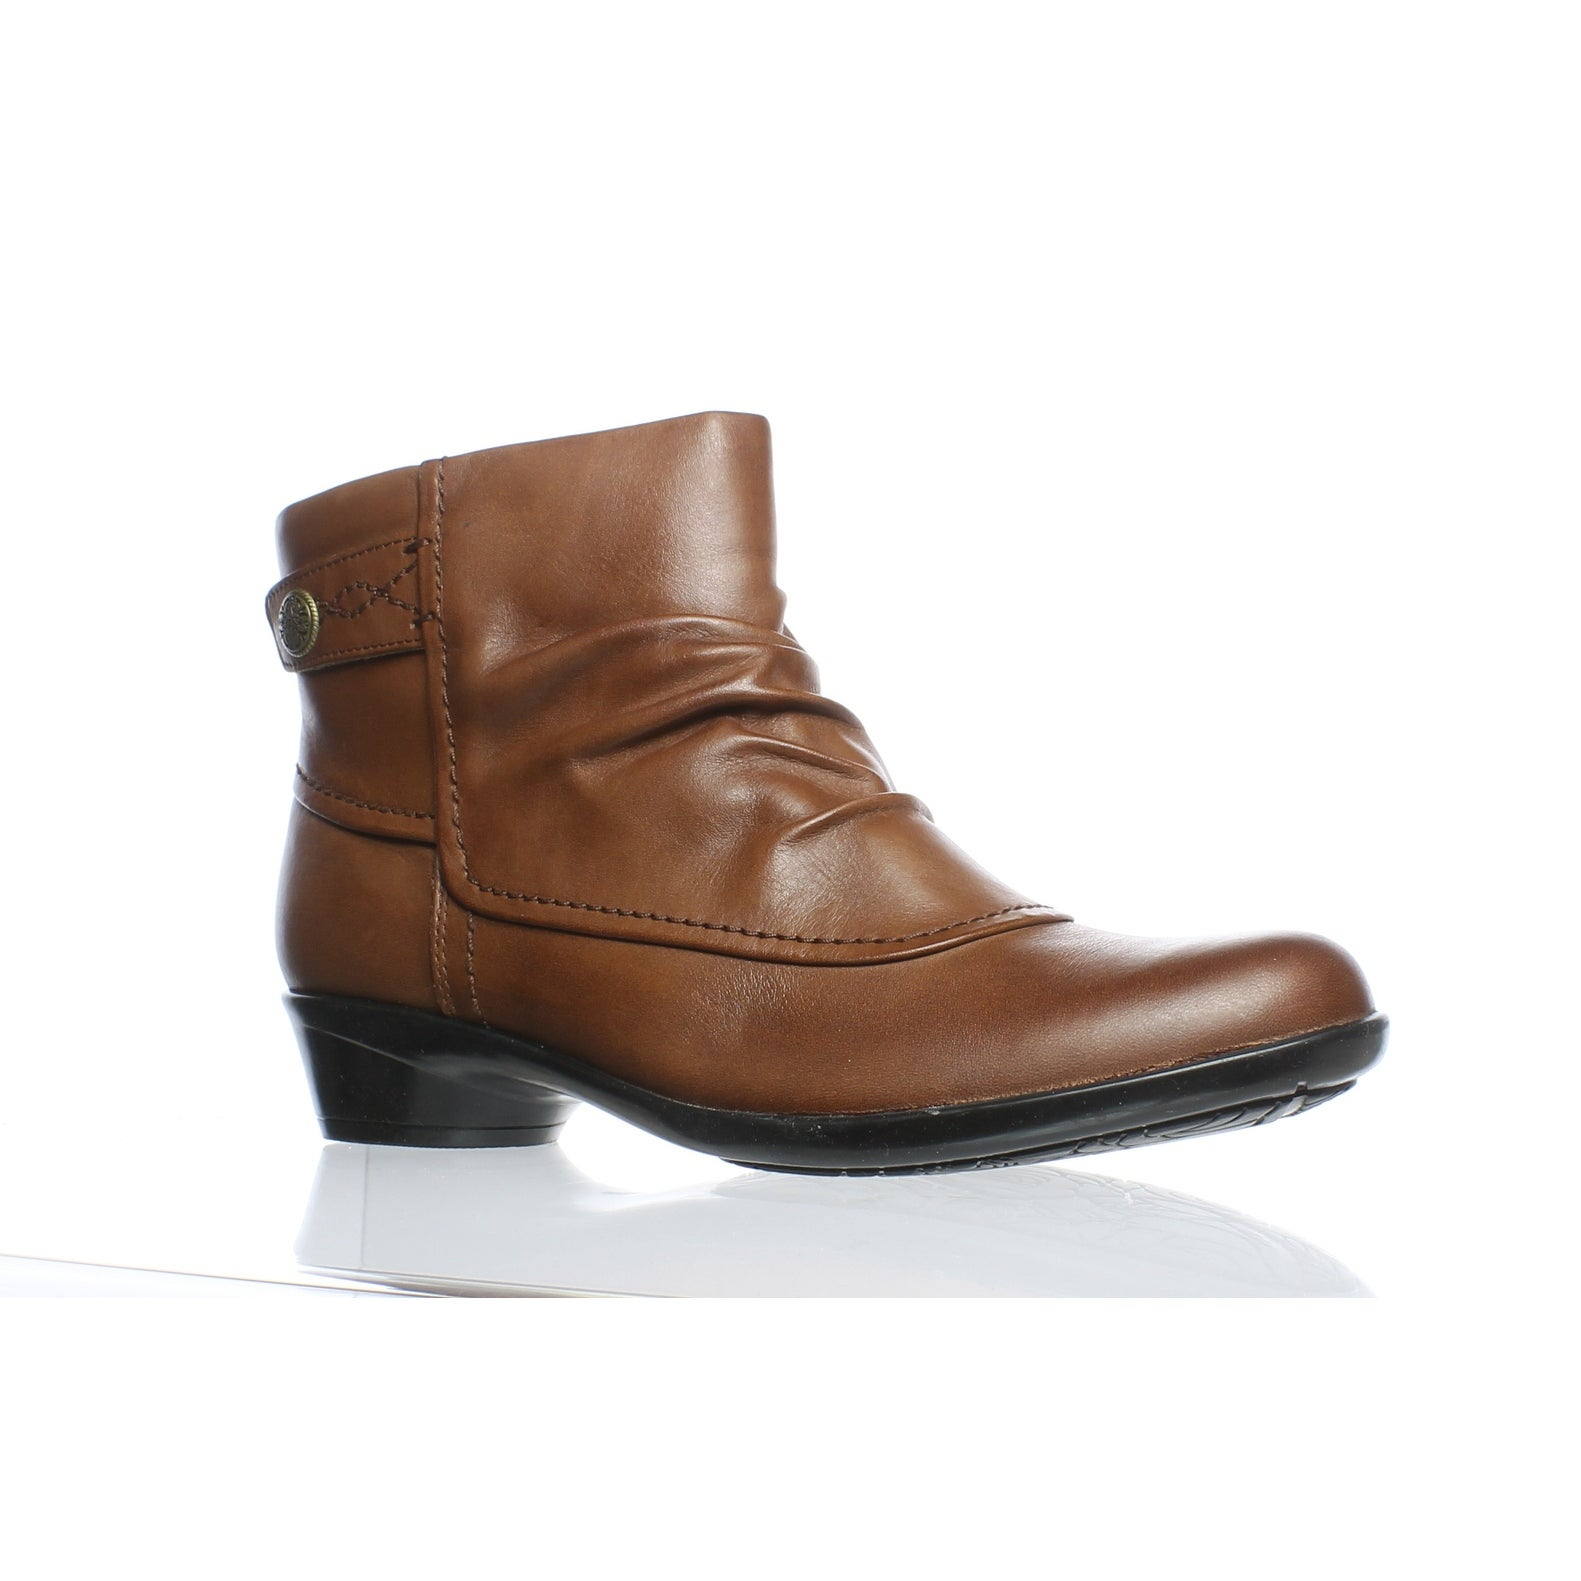 dd0498c28c886 Buy Rockport Women's Boots Online at Overstock   Our Best Women's ...